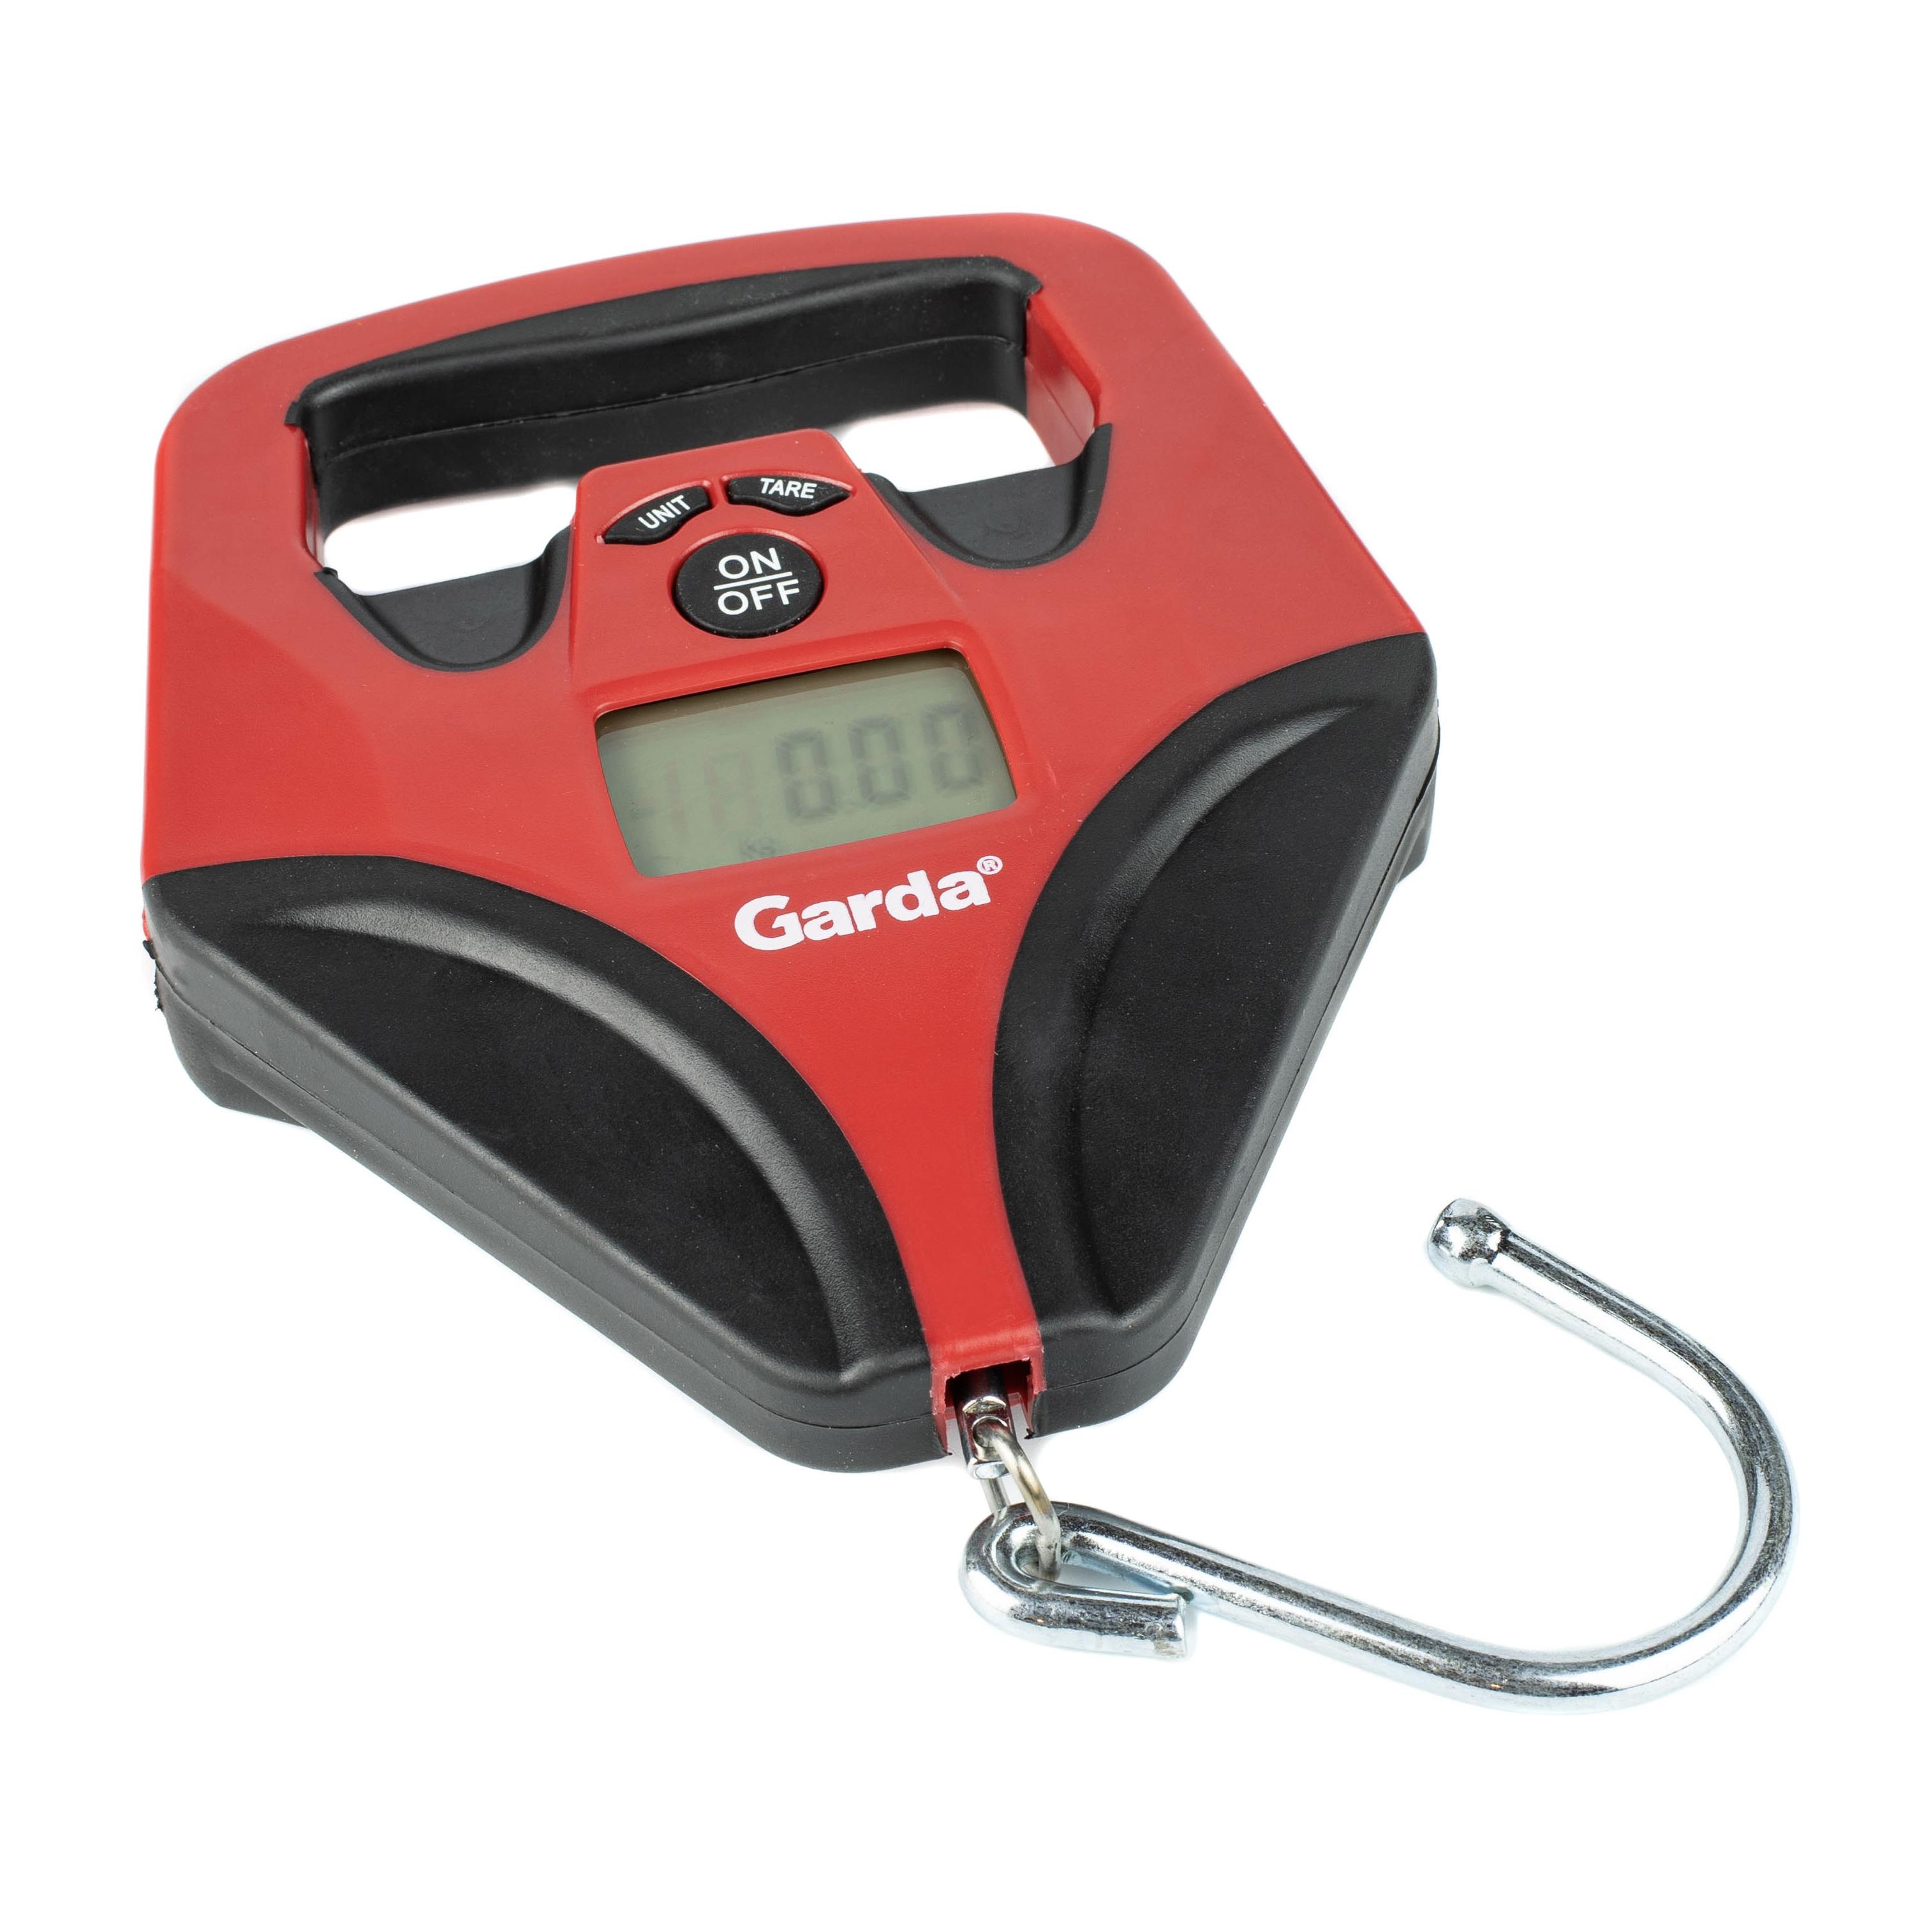 Garda - Digitální váha Multi grip 50kg